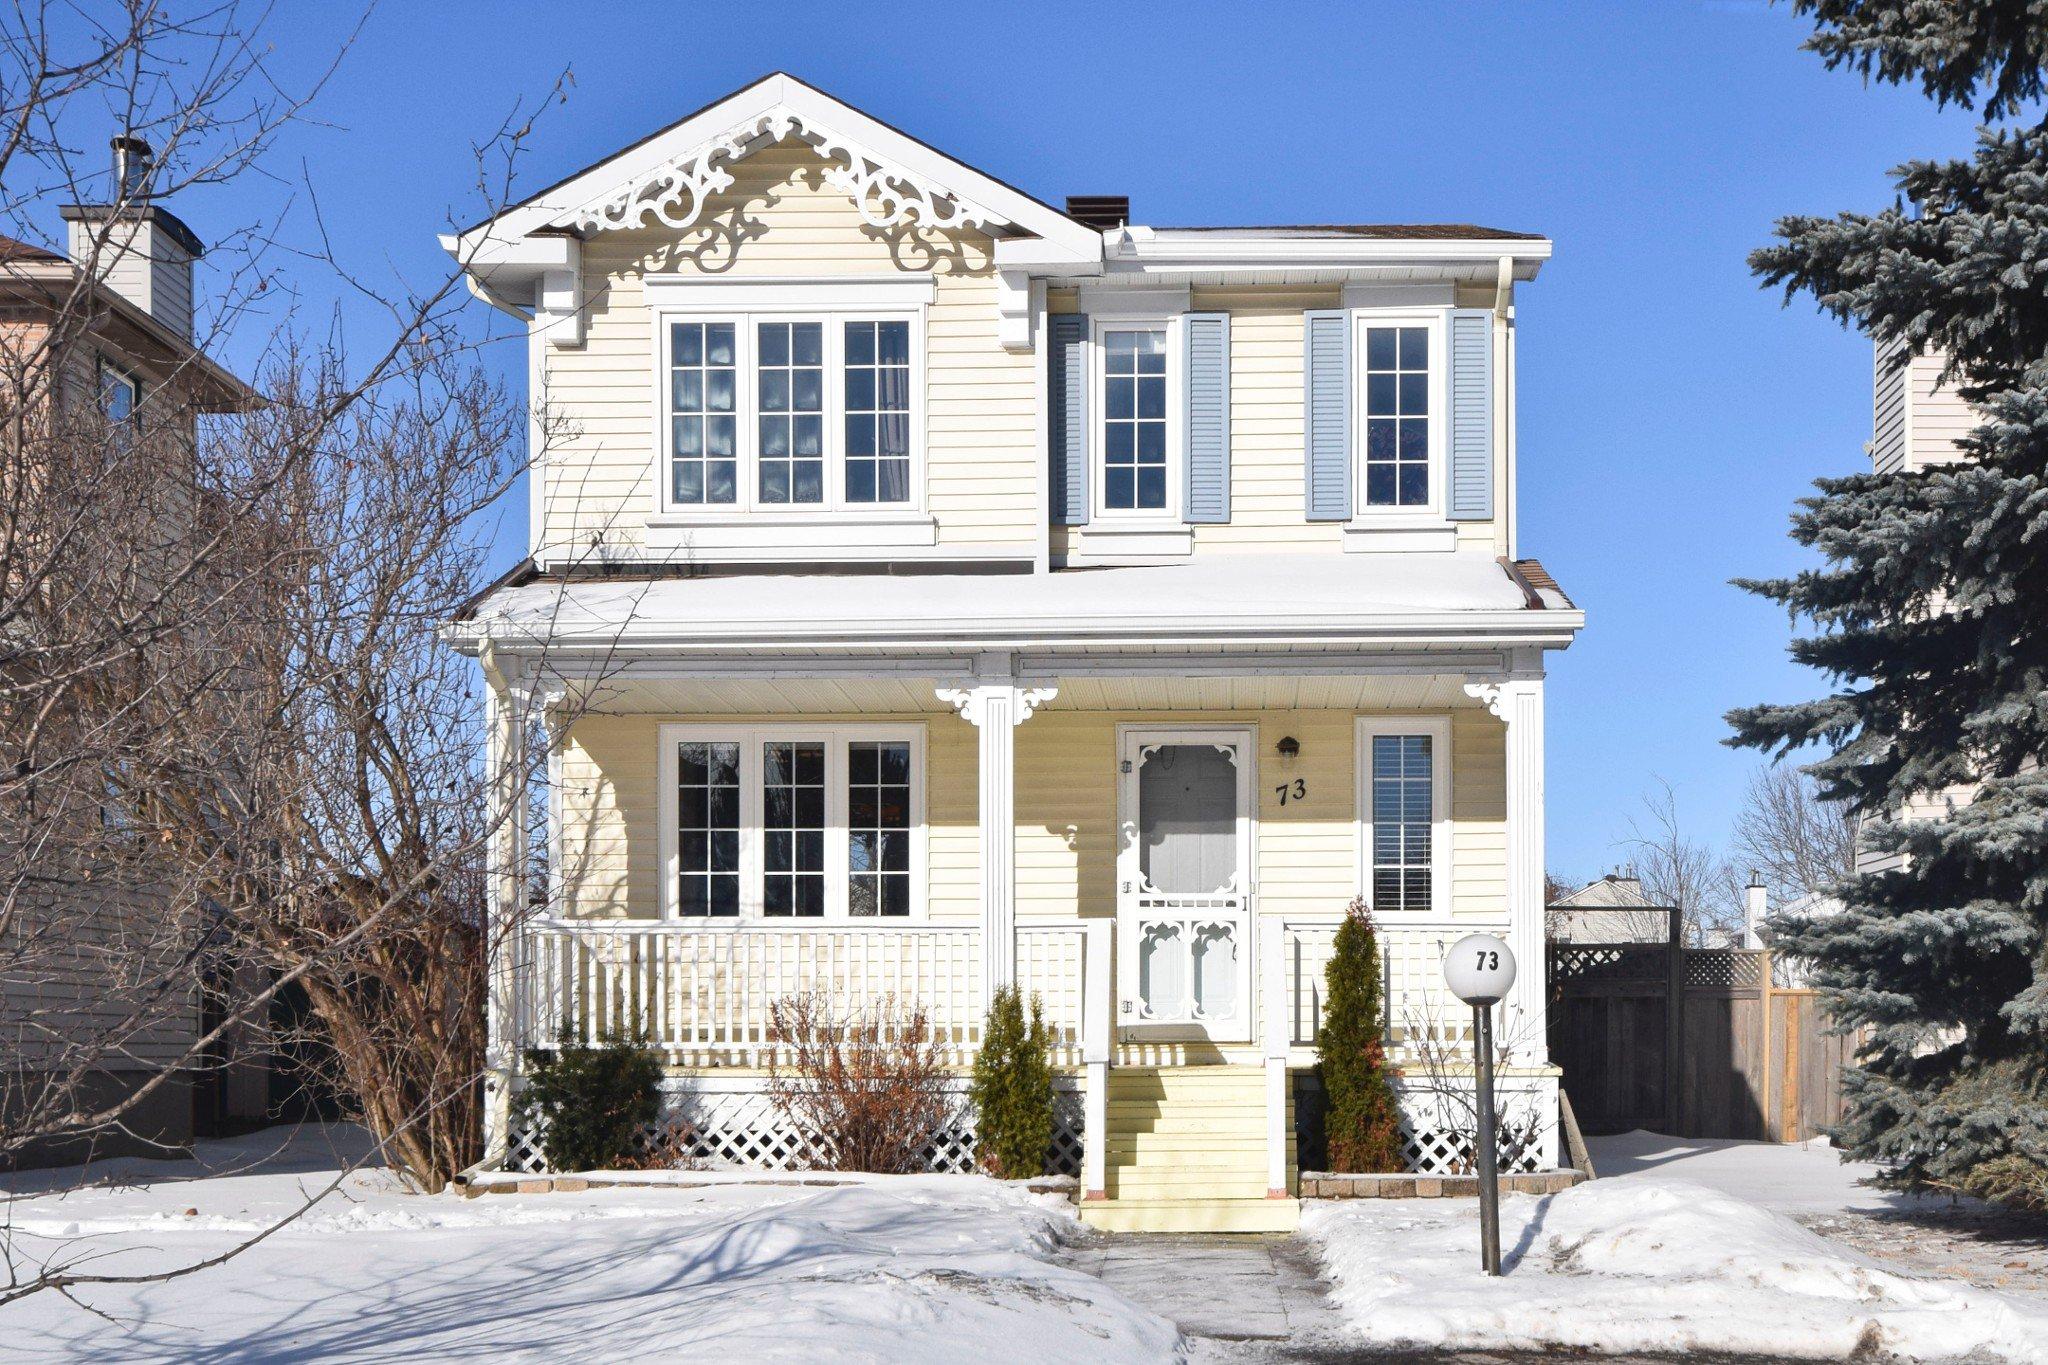 Main Photo: 73 Houlahan Street in Ottawa: House for sale : MLS®# 1090130